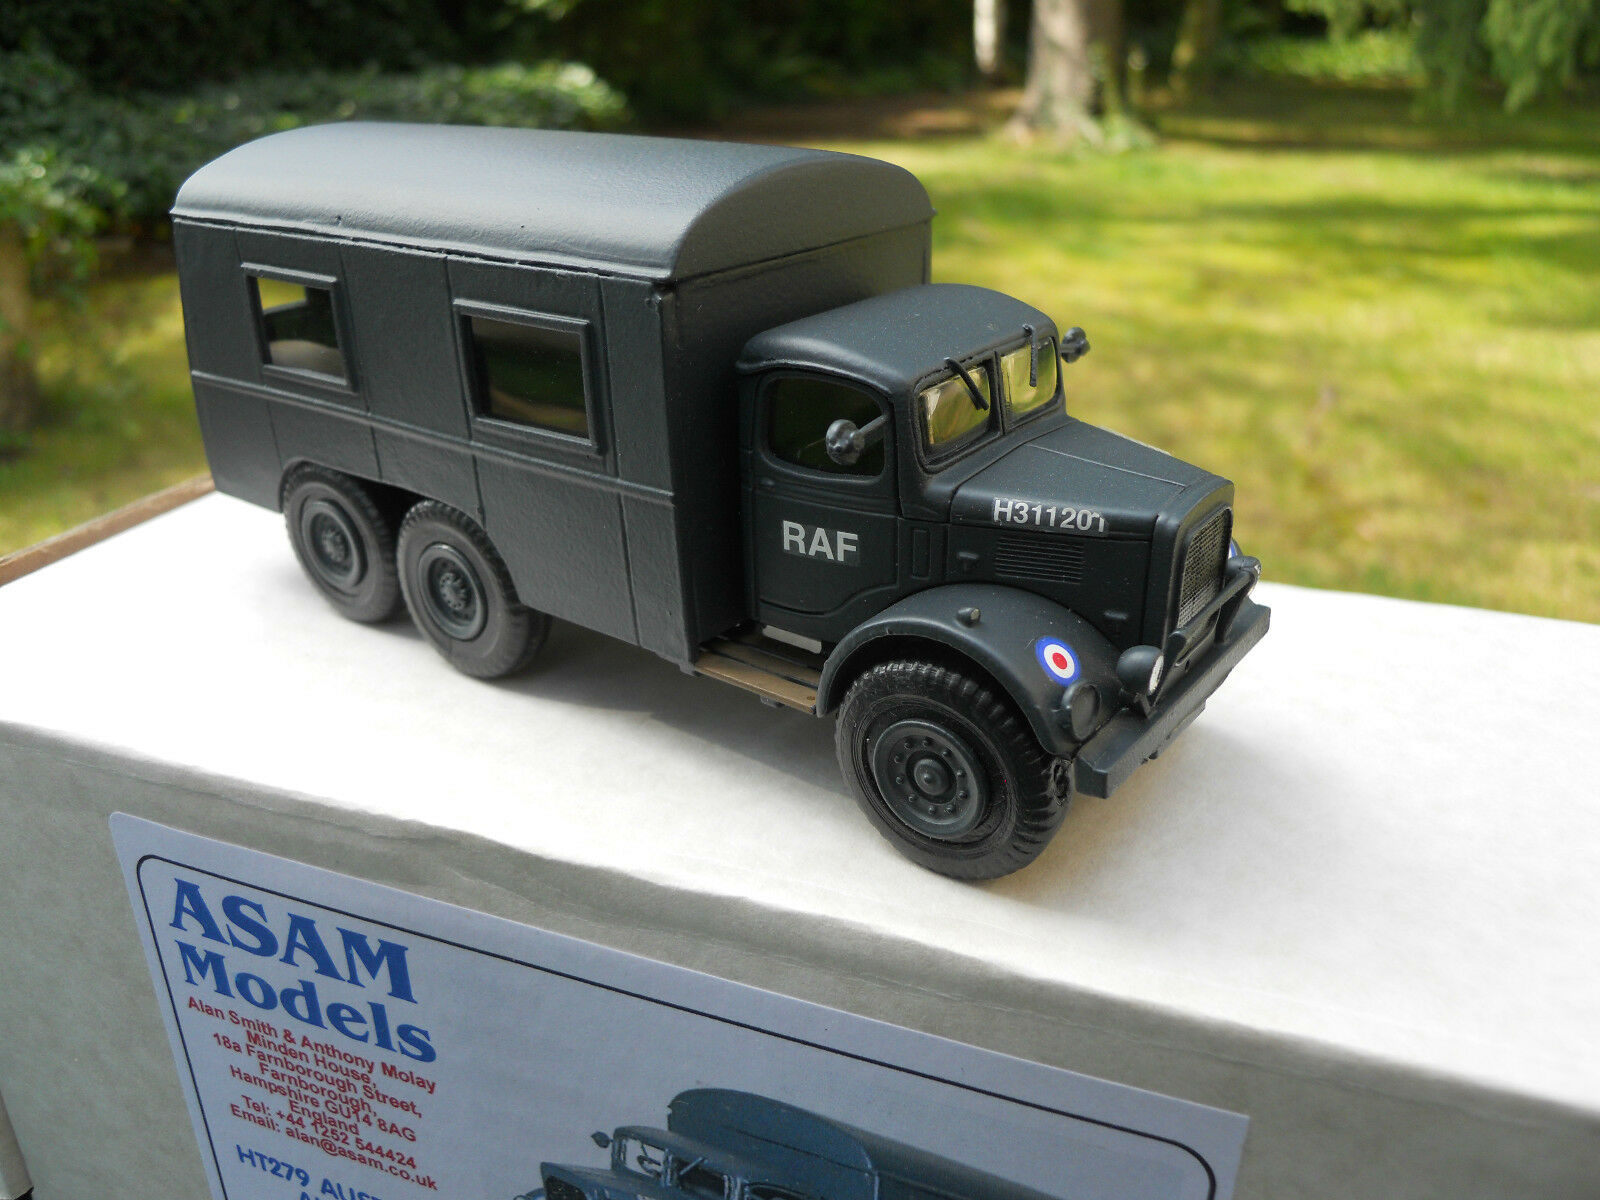 VEHICULE MILITAIRE ASAM MODELS MODELS MODELS REF HT 279 AUSTIN K6  6X4 RAF CREW BUS MINT BOX   New Style  c34ab8